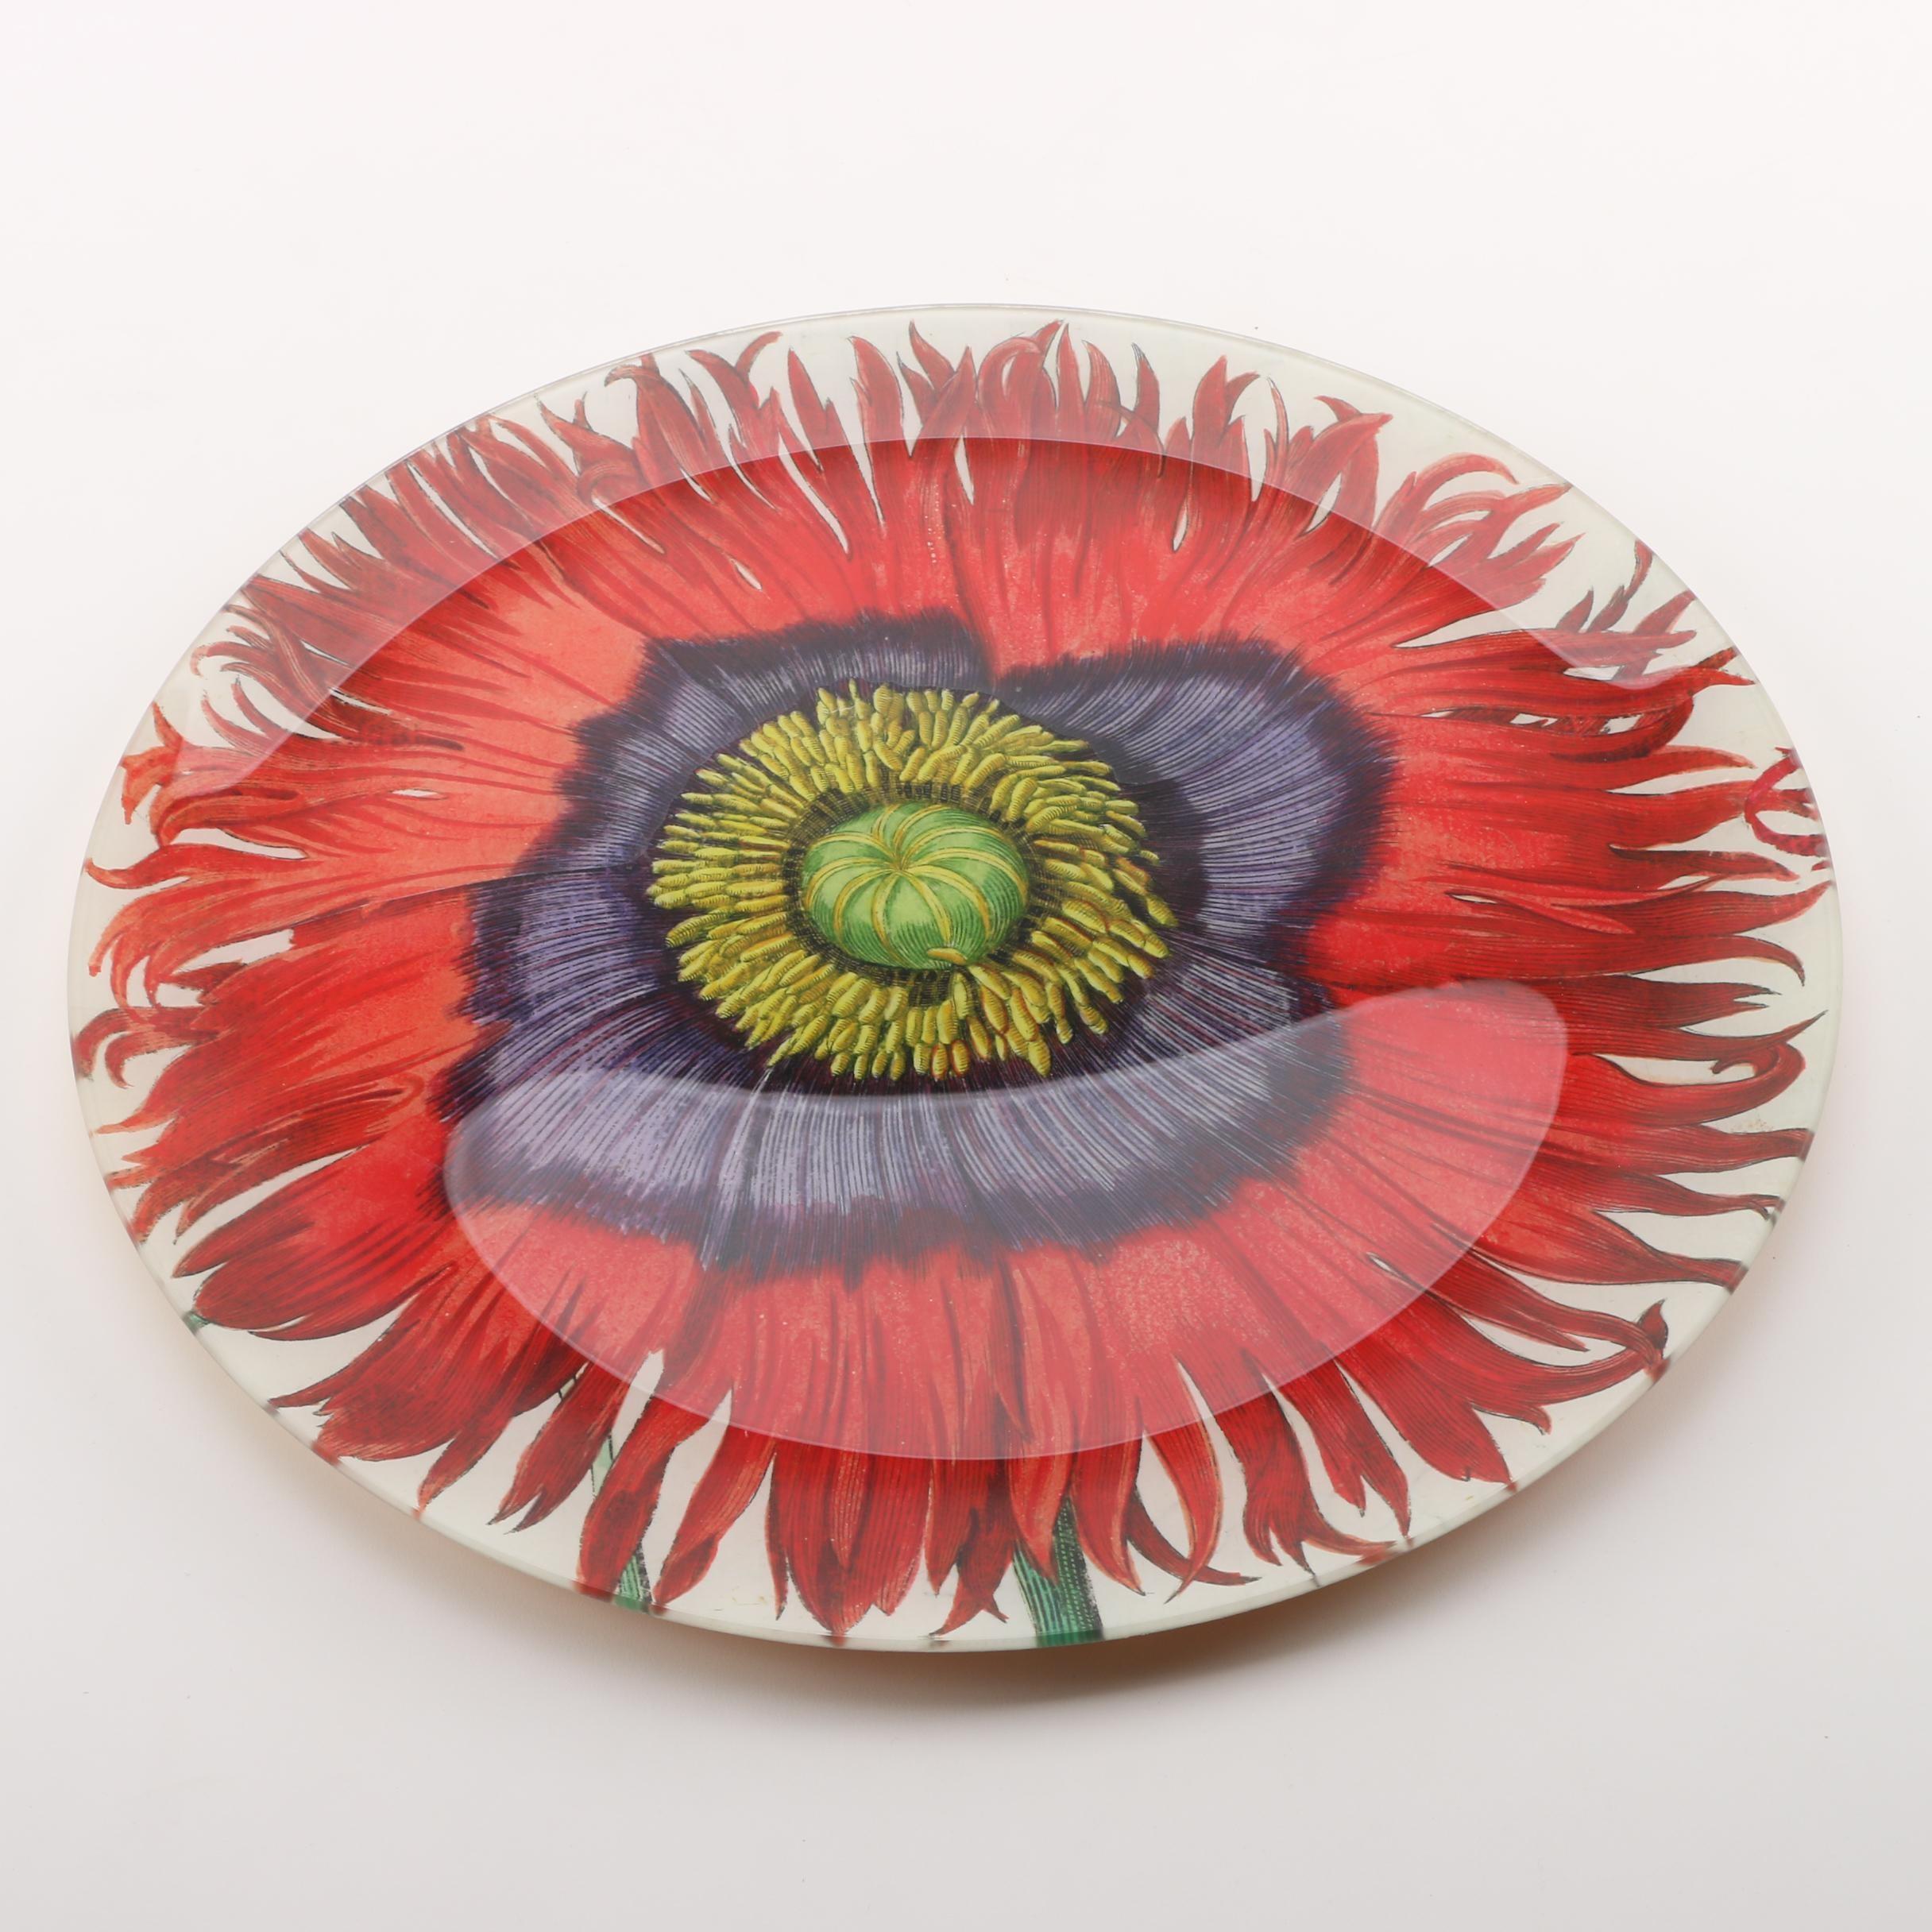 John Derian Company Decorative Glass Floral Plate